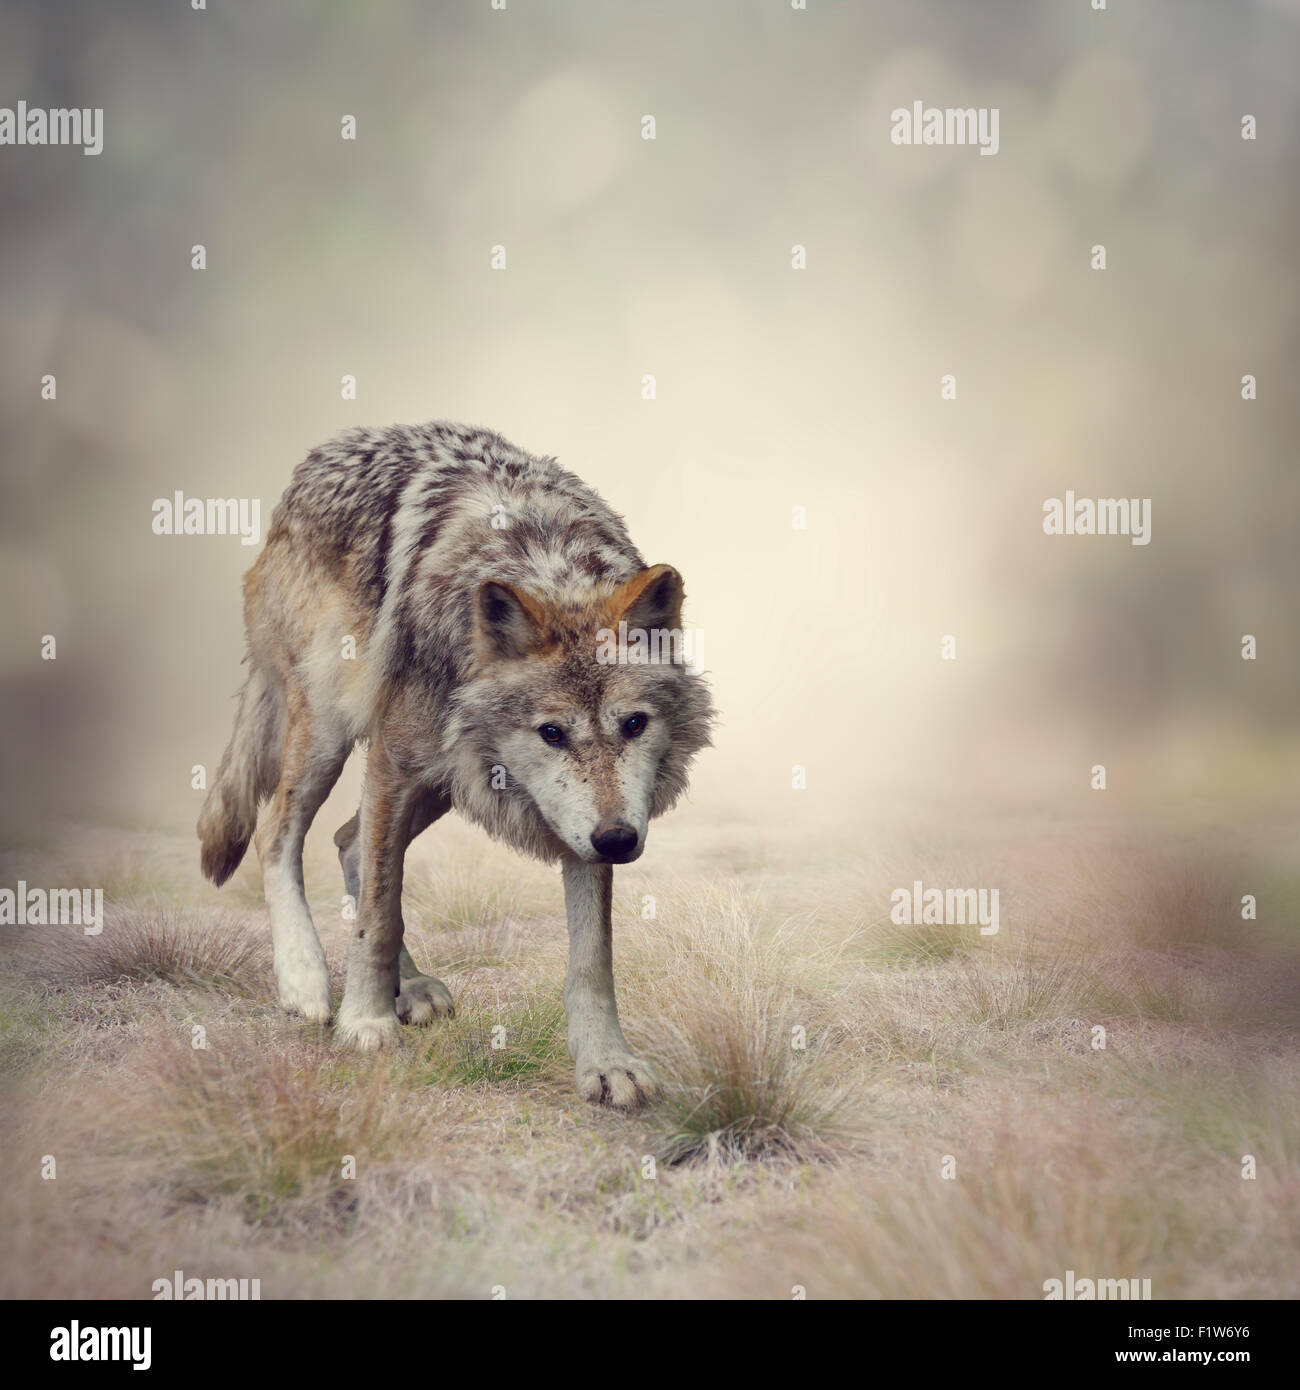 Porträt des Gehens Gray Wolf Stockbild